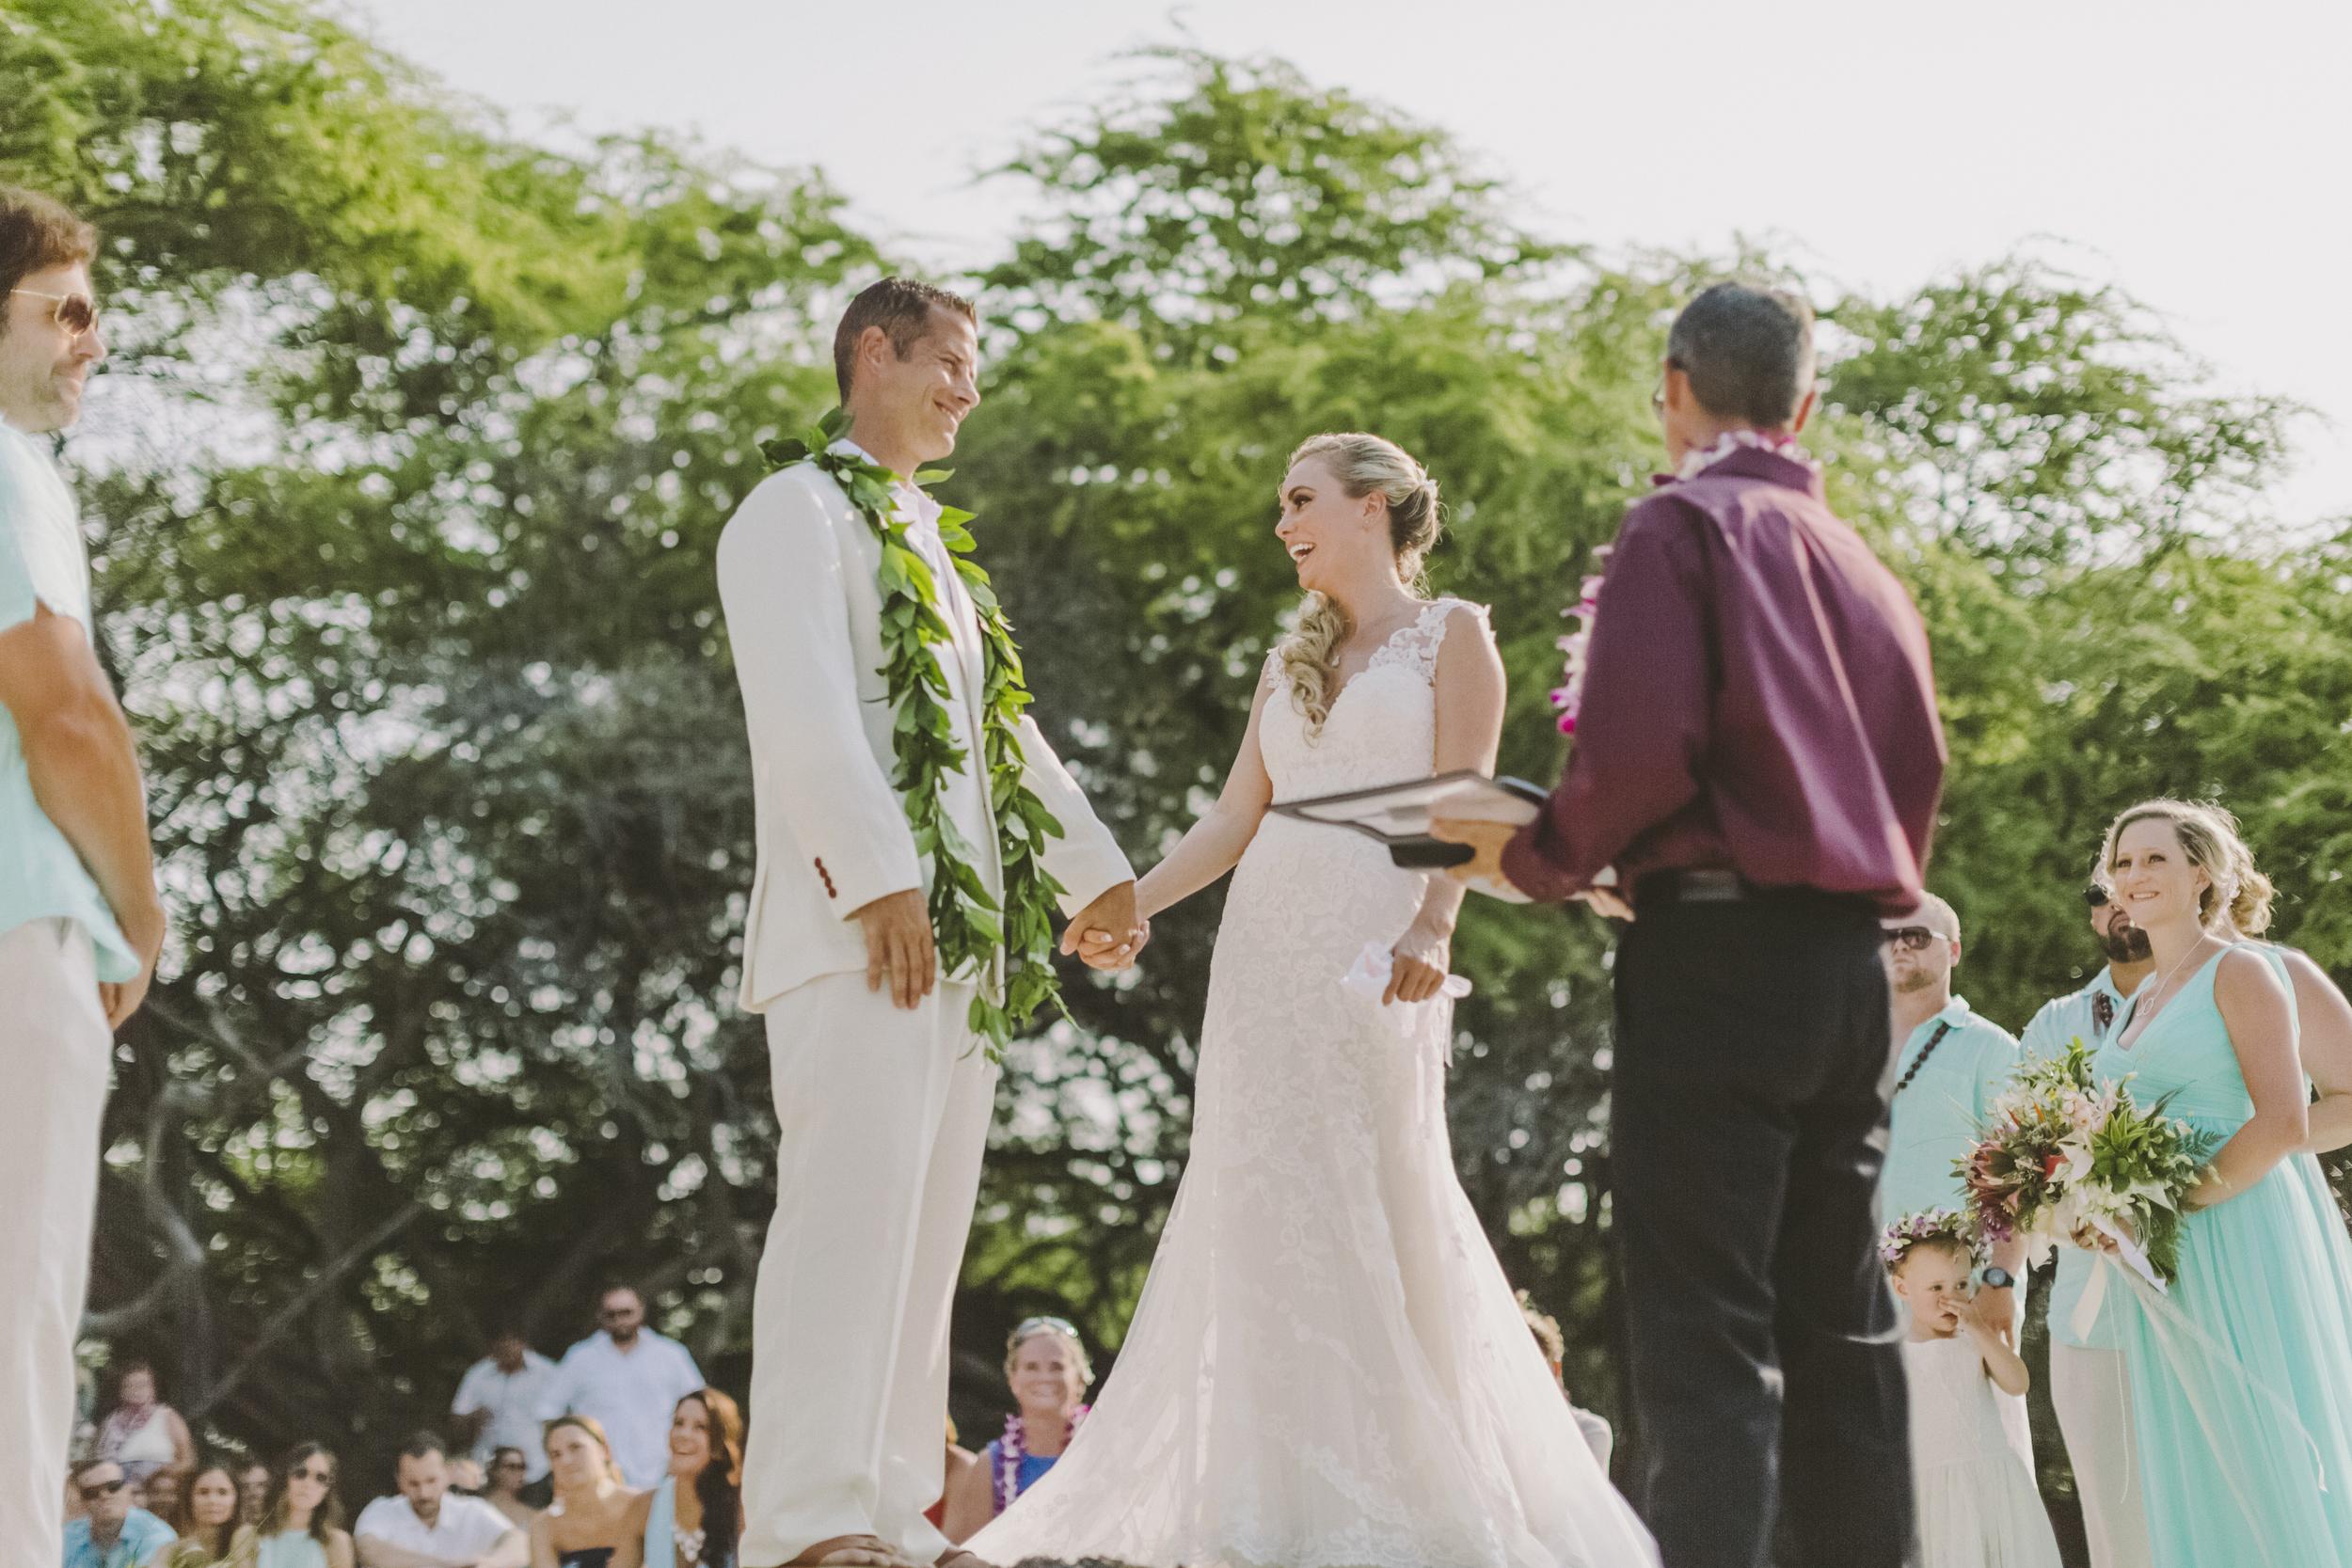 angie-diaz-photography-hawaii-wedding-photographer-kelli-jay-59.jpg